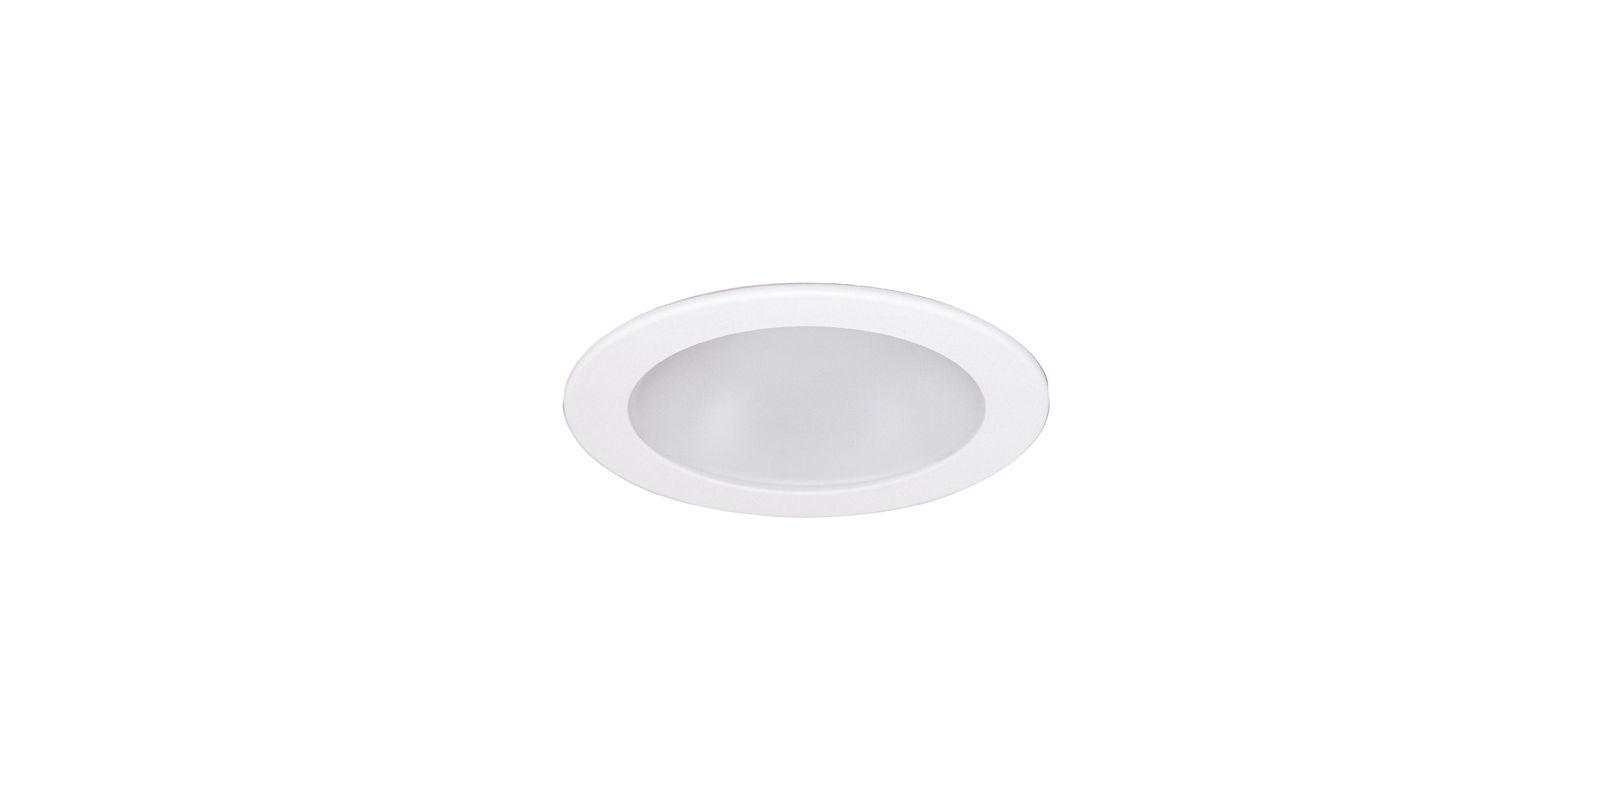 Elco EL1412 4&quote Low Voltage Adjustable Shower Trim with Diffused Lens